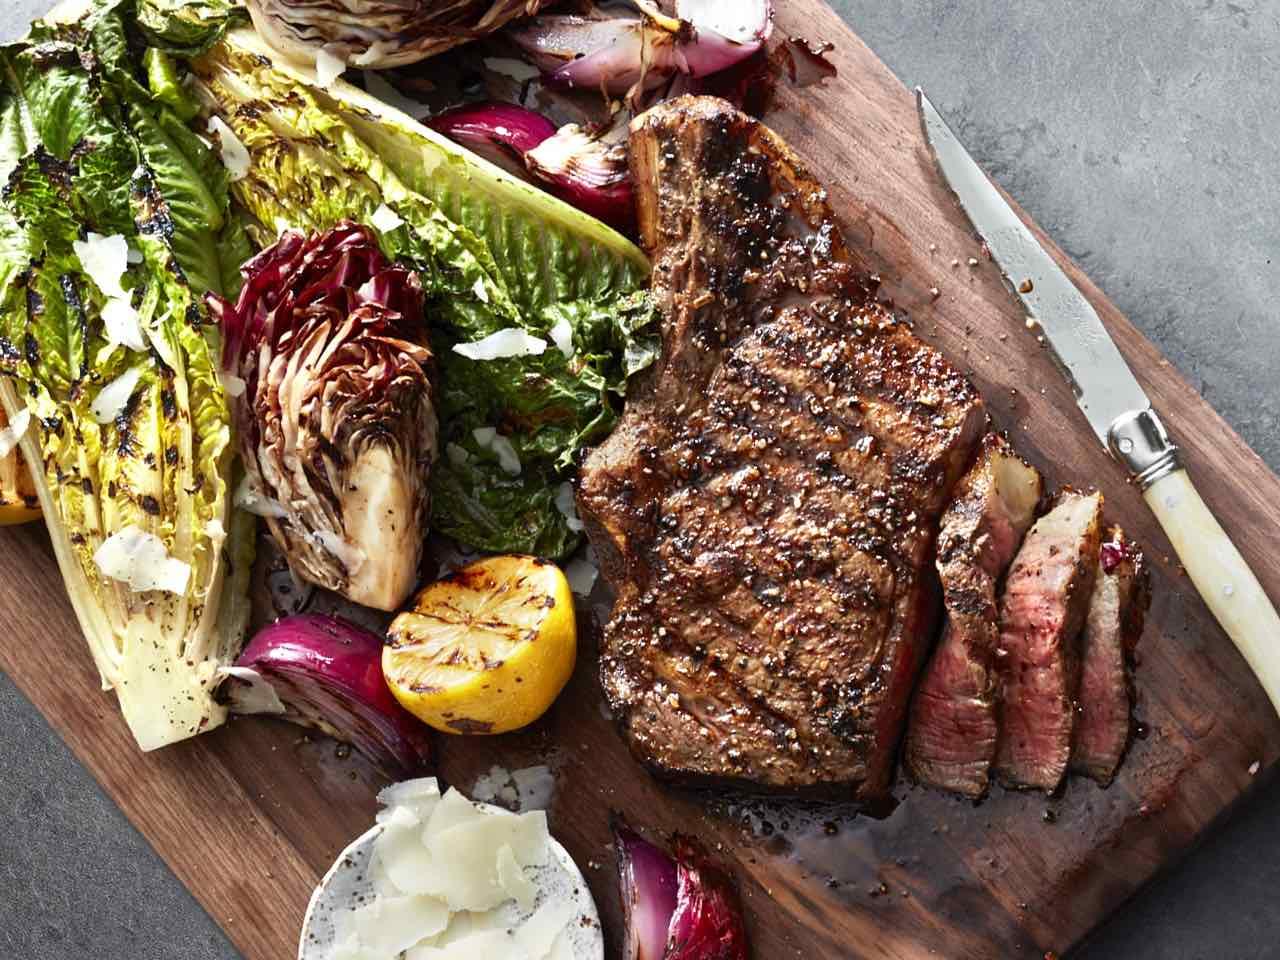 Grilled steak with caesar salad